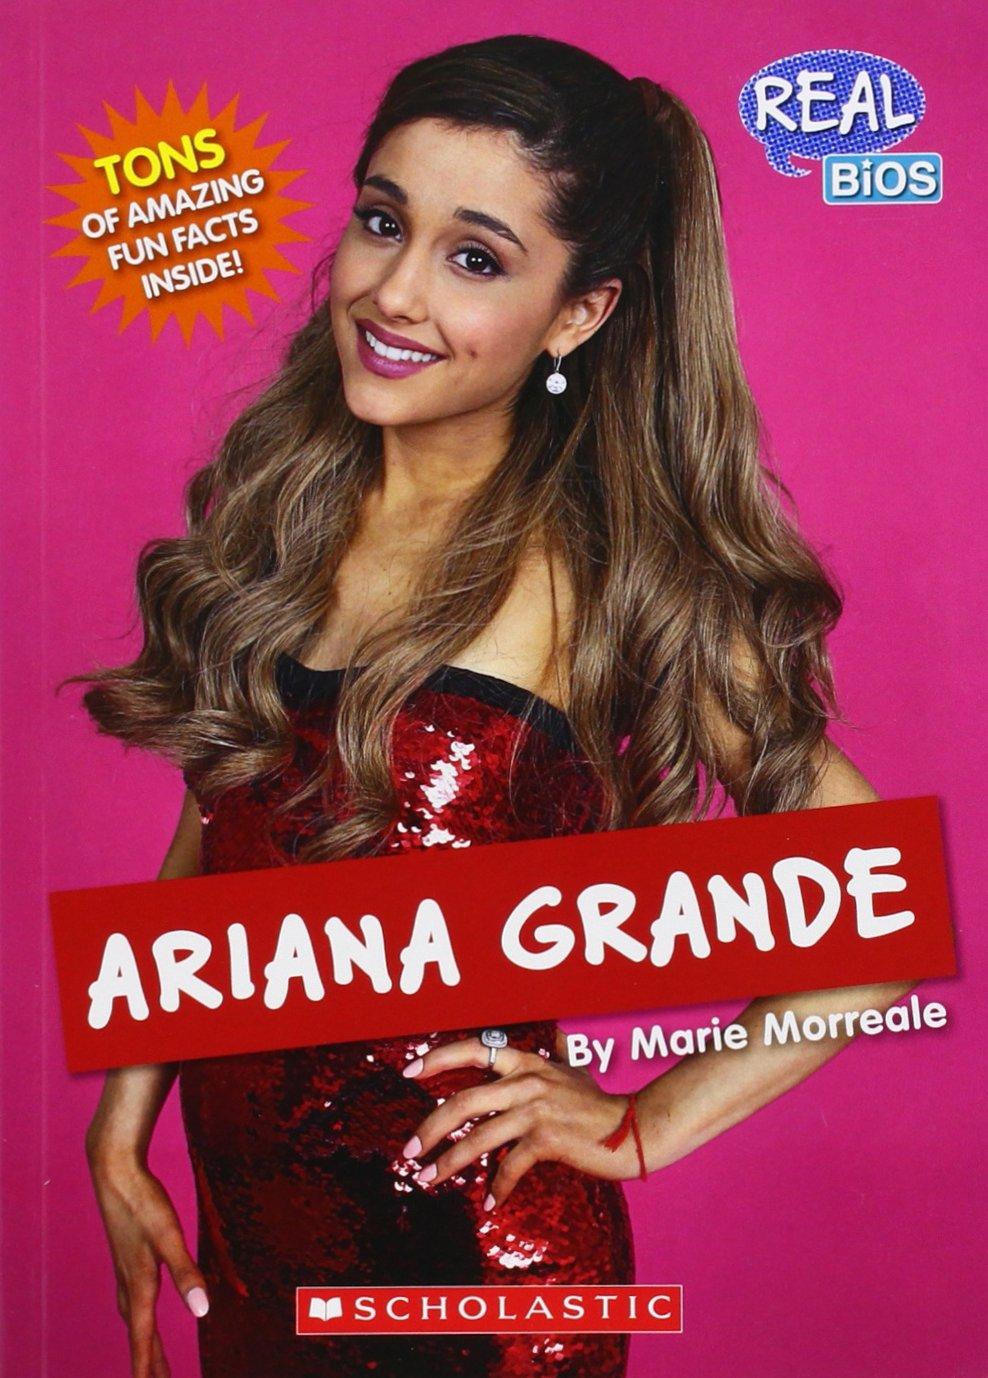 Ariana Grande (Real Bios)